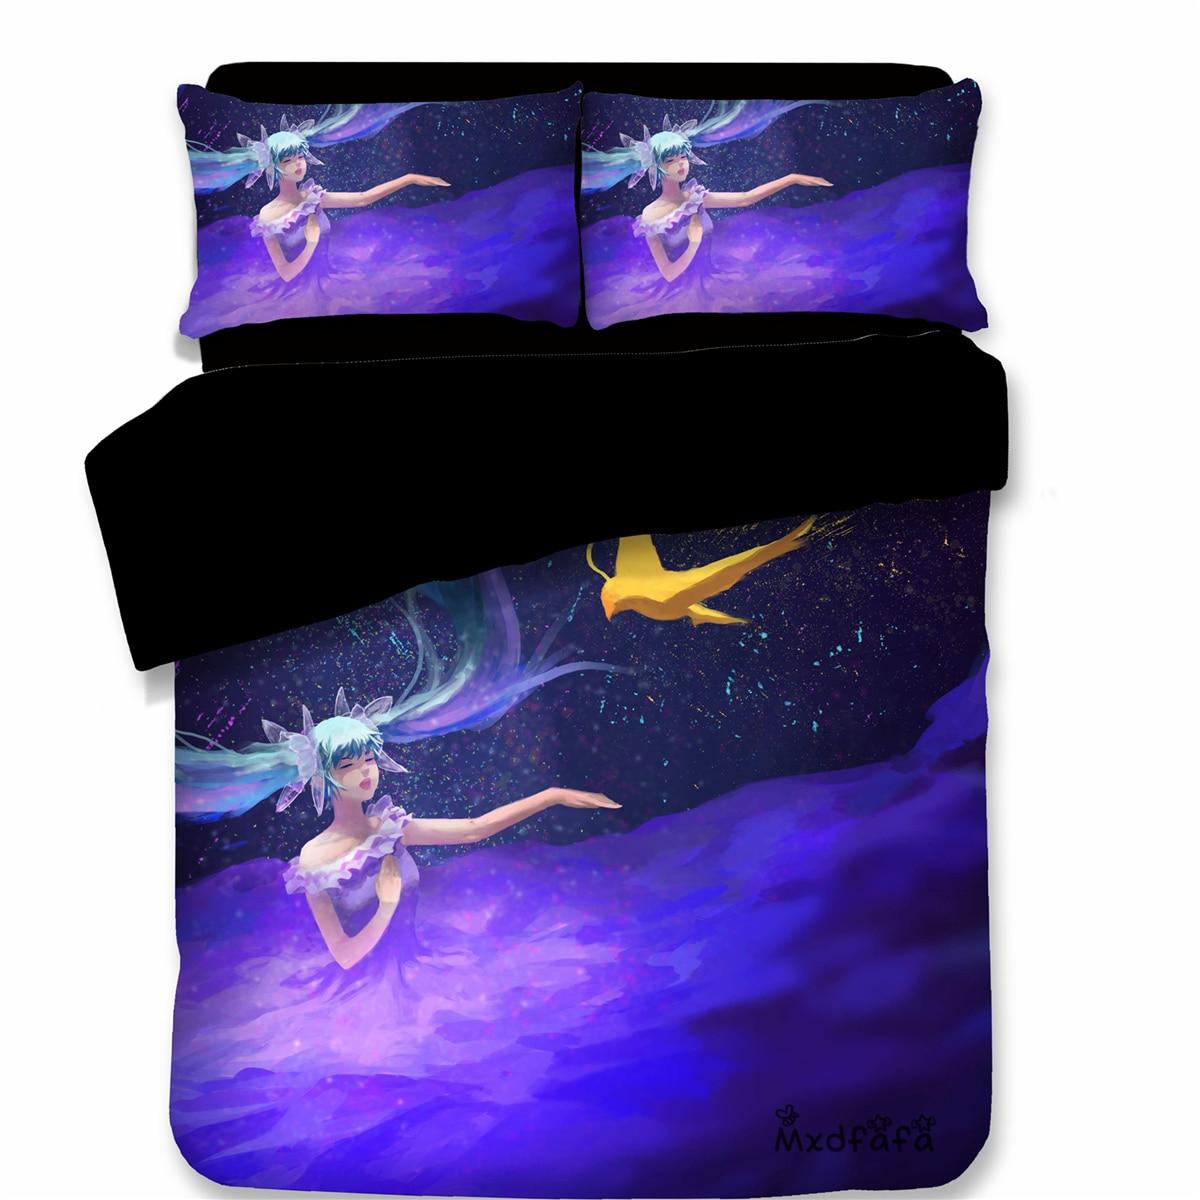 Mxdfafa Anime Snow Miku Printed Duvet Cover Set 3D Bedding Set Luxury Comforter Bedding Set with 1 Duvet Cover and 2 PillowcasesMxdfafa Anime Snow Miku Printed Duvet Cover Set 3D Bedding Set Luxury Comforter Bedding Set with 1 Duvet Cover and 2 Pillowcases